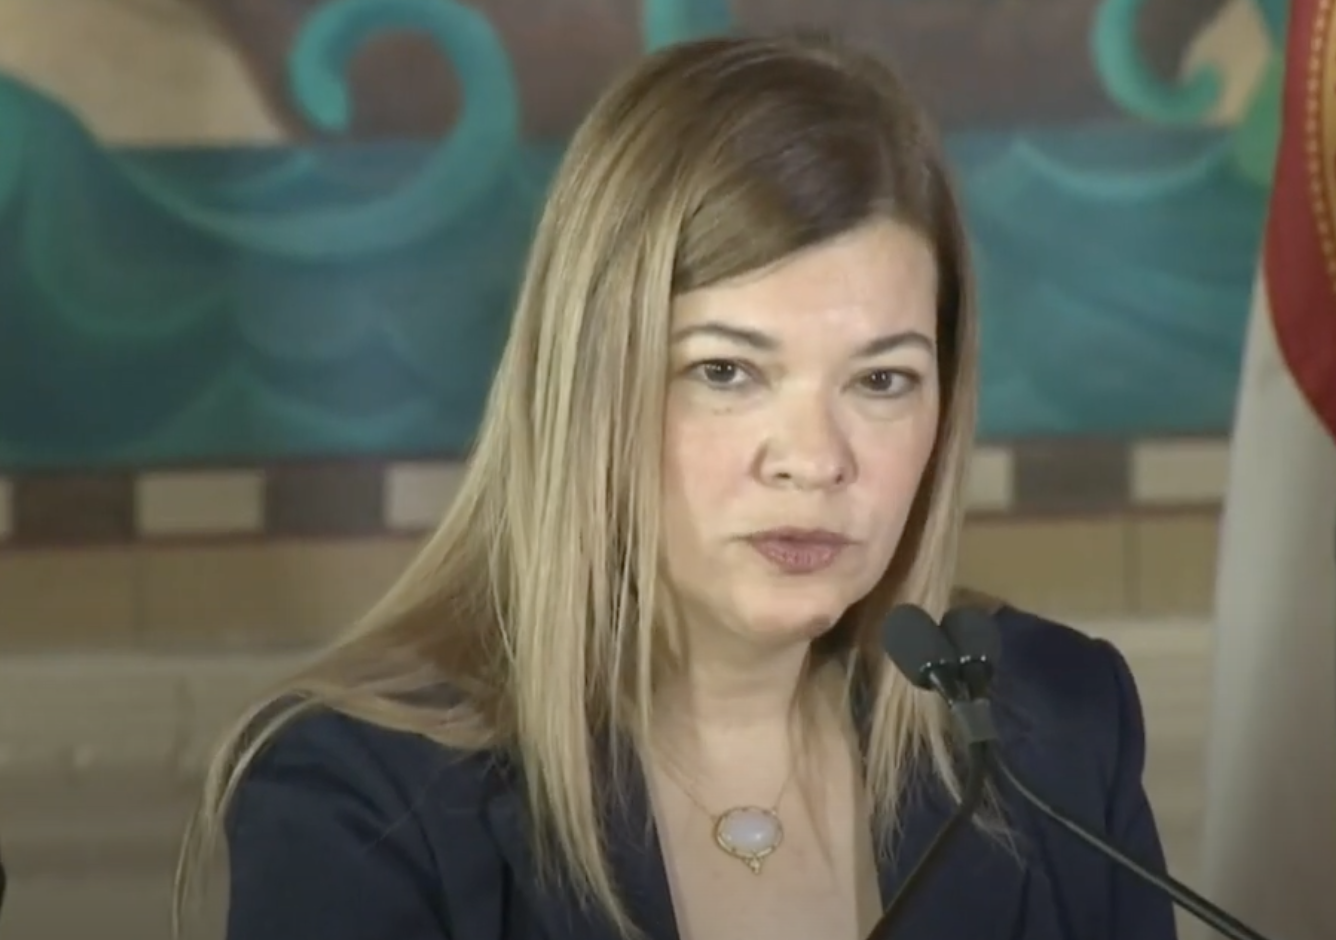 Florida Republican's praise for Judge Barbara Lagoa could sway Trump